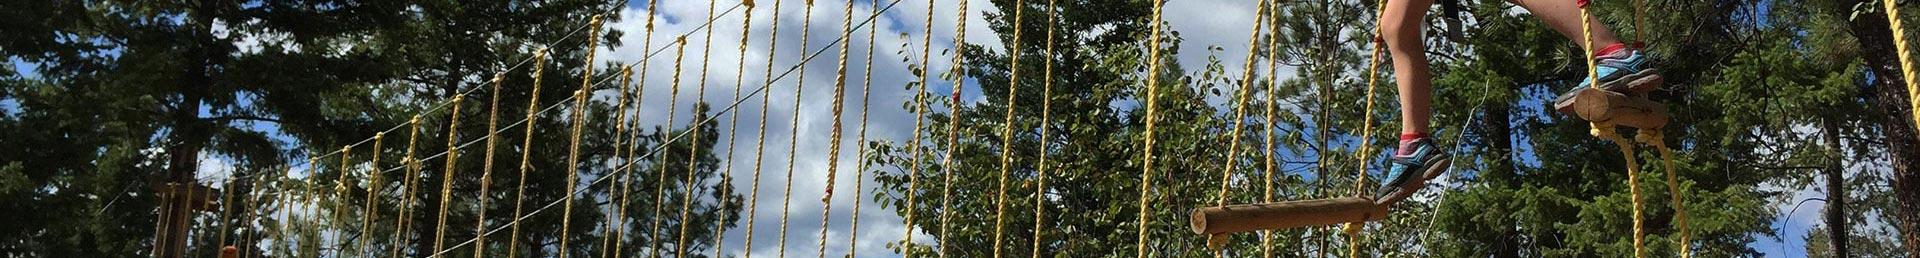 Accrobranche - Grimpe d'arbres Moselle